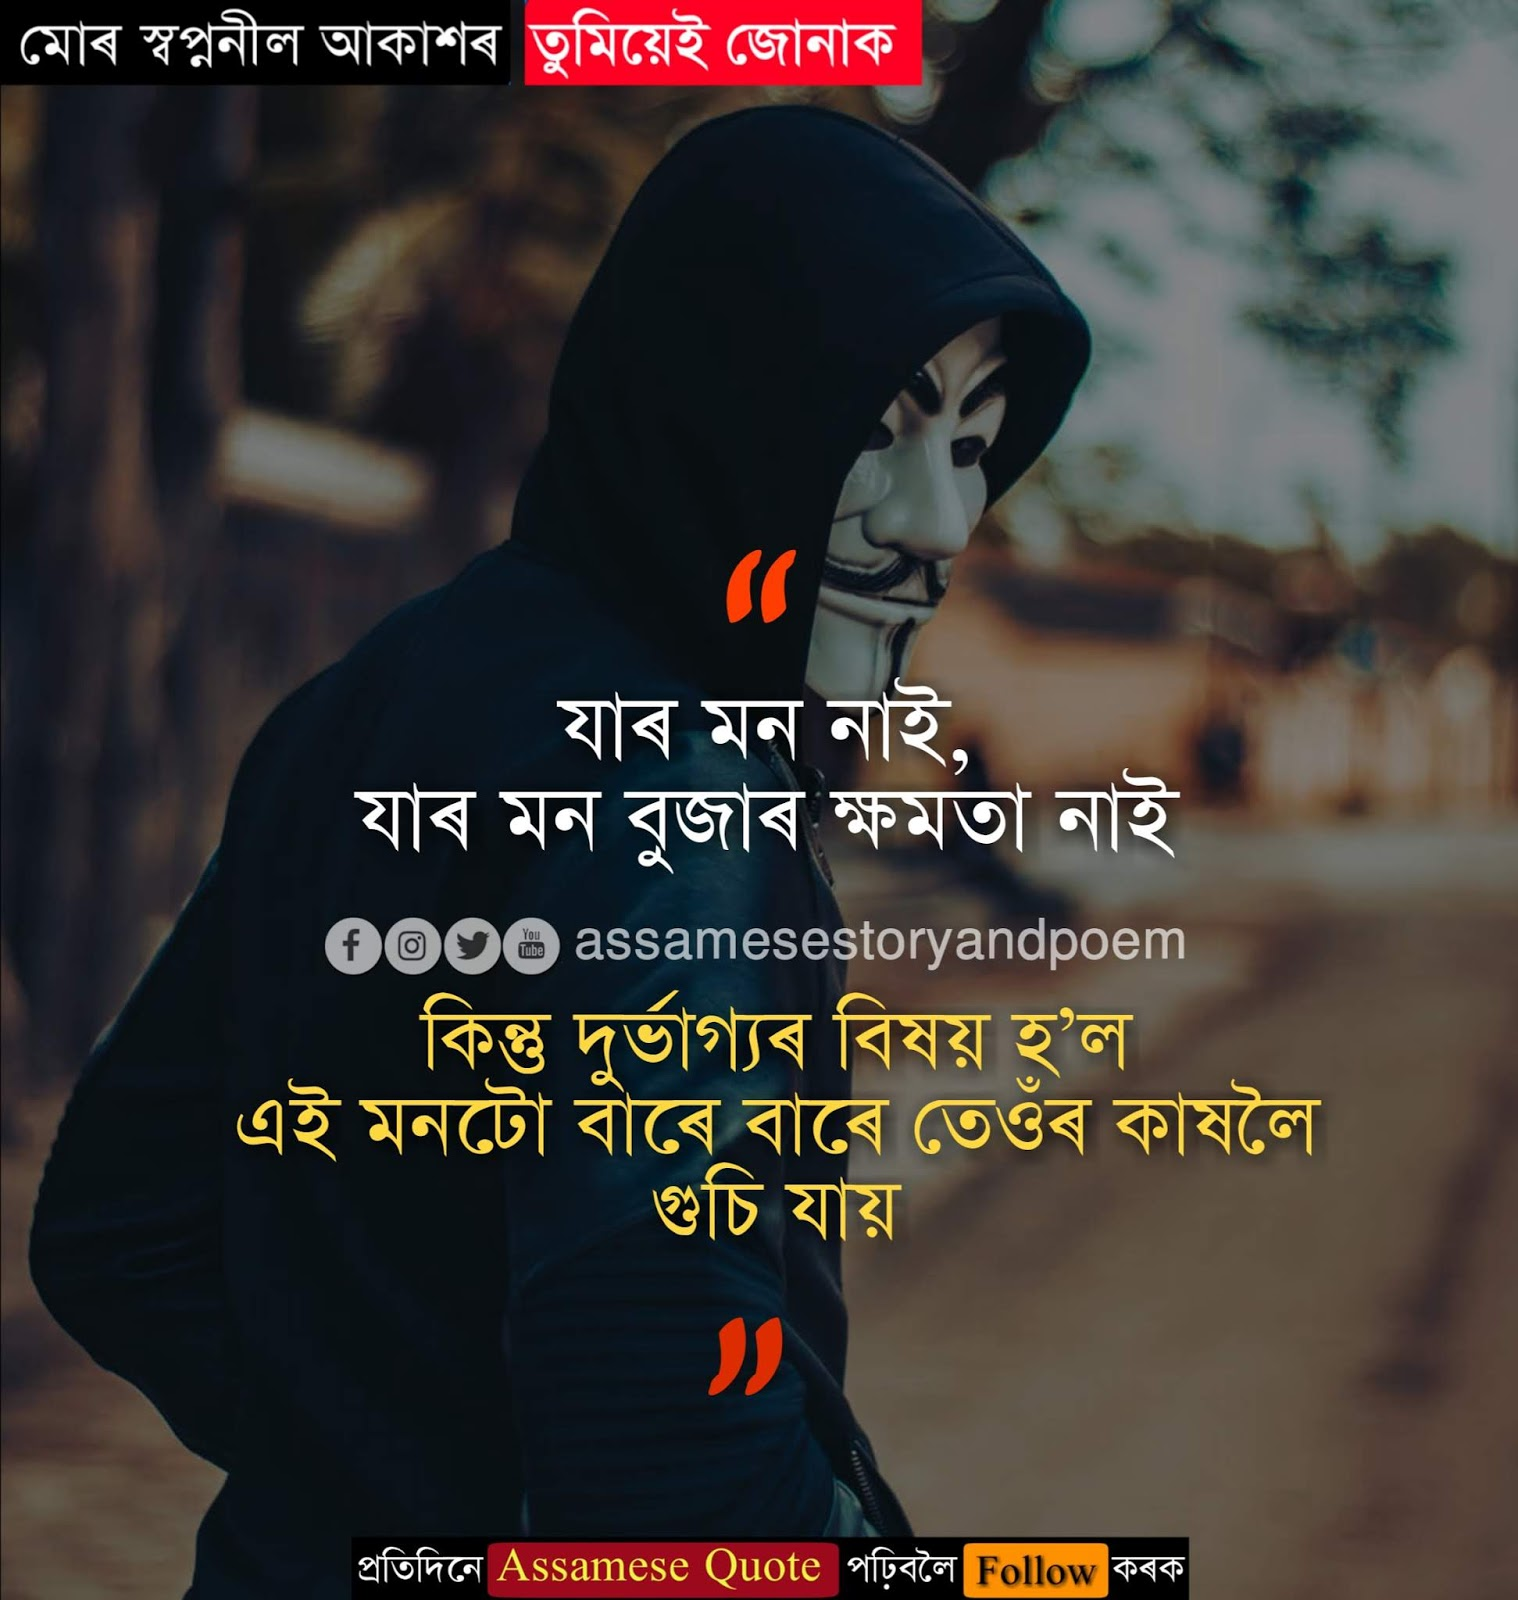 Sad Love And Life Status In Assamese